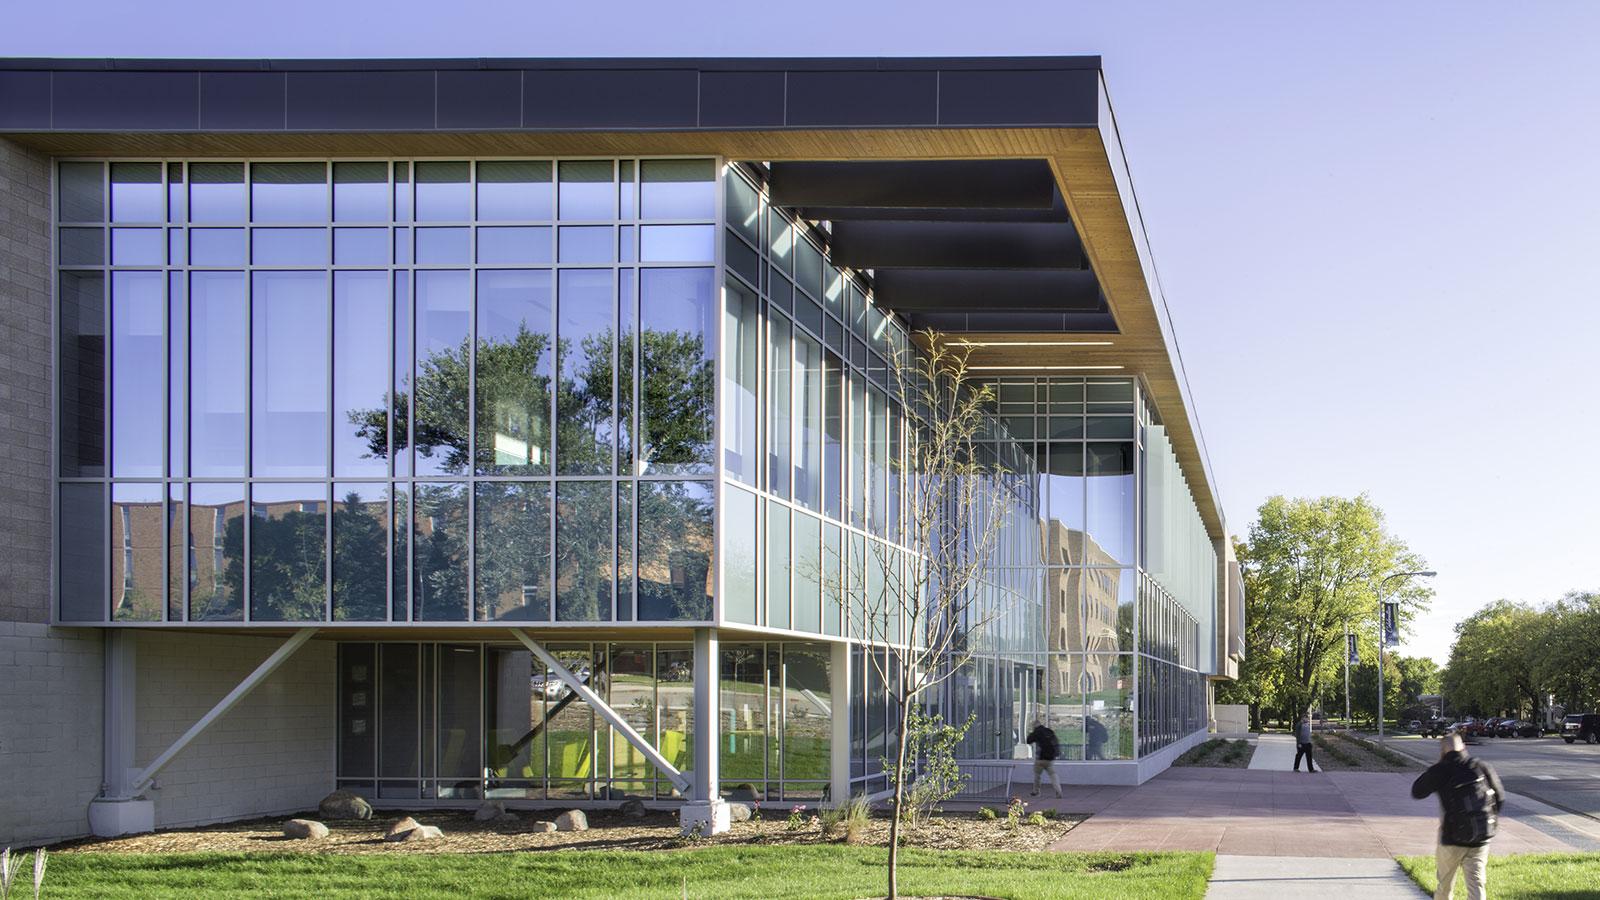 Dakota State University Beacom Institute of Technology